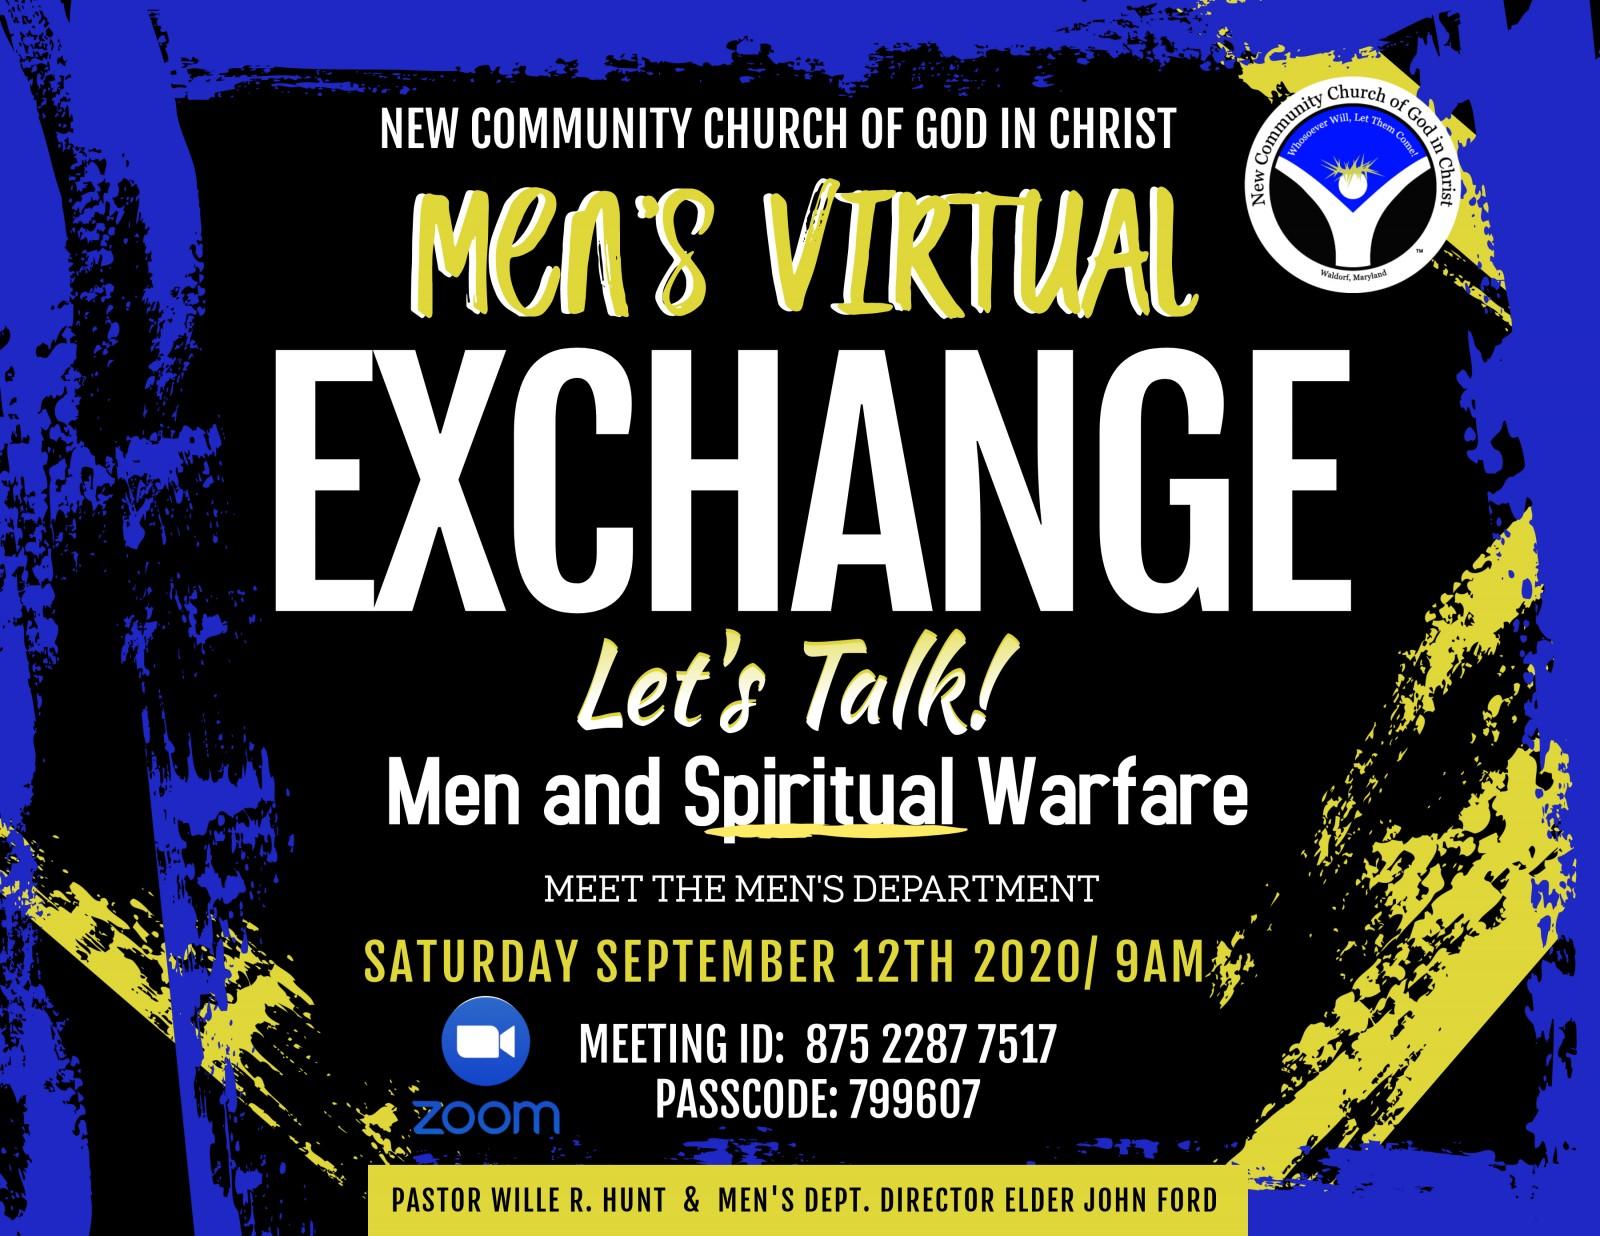 MENS VIRTUAL EXCHANGE SEP 26 (1)